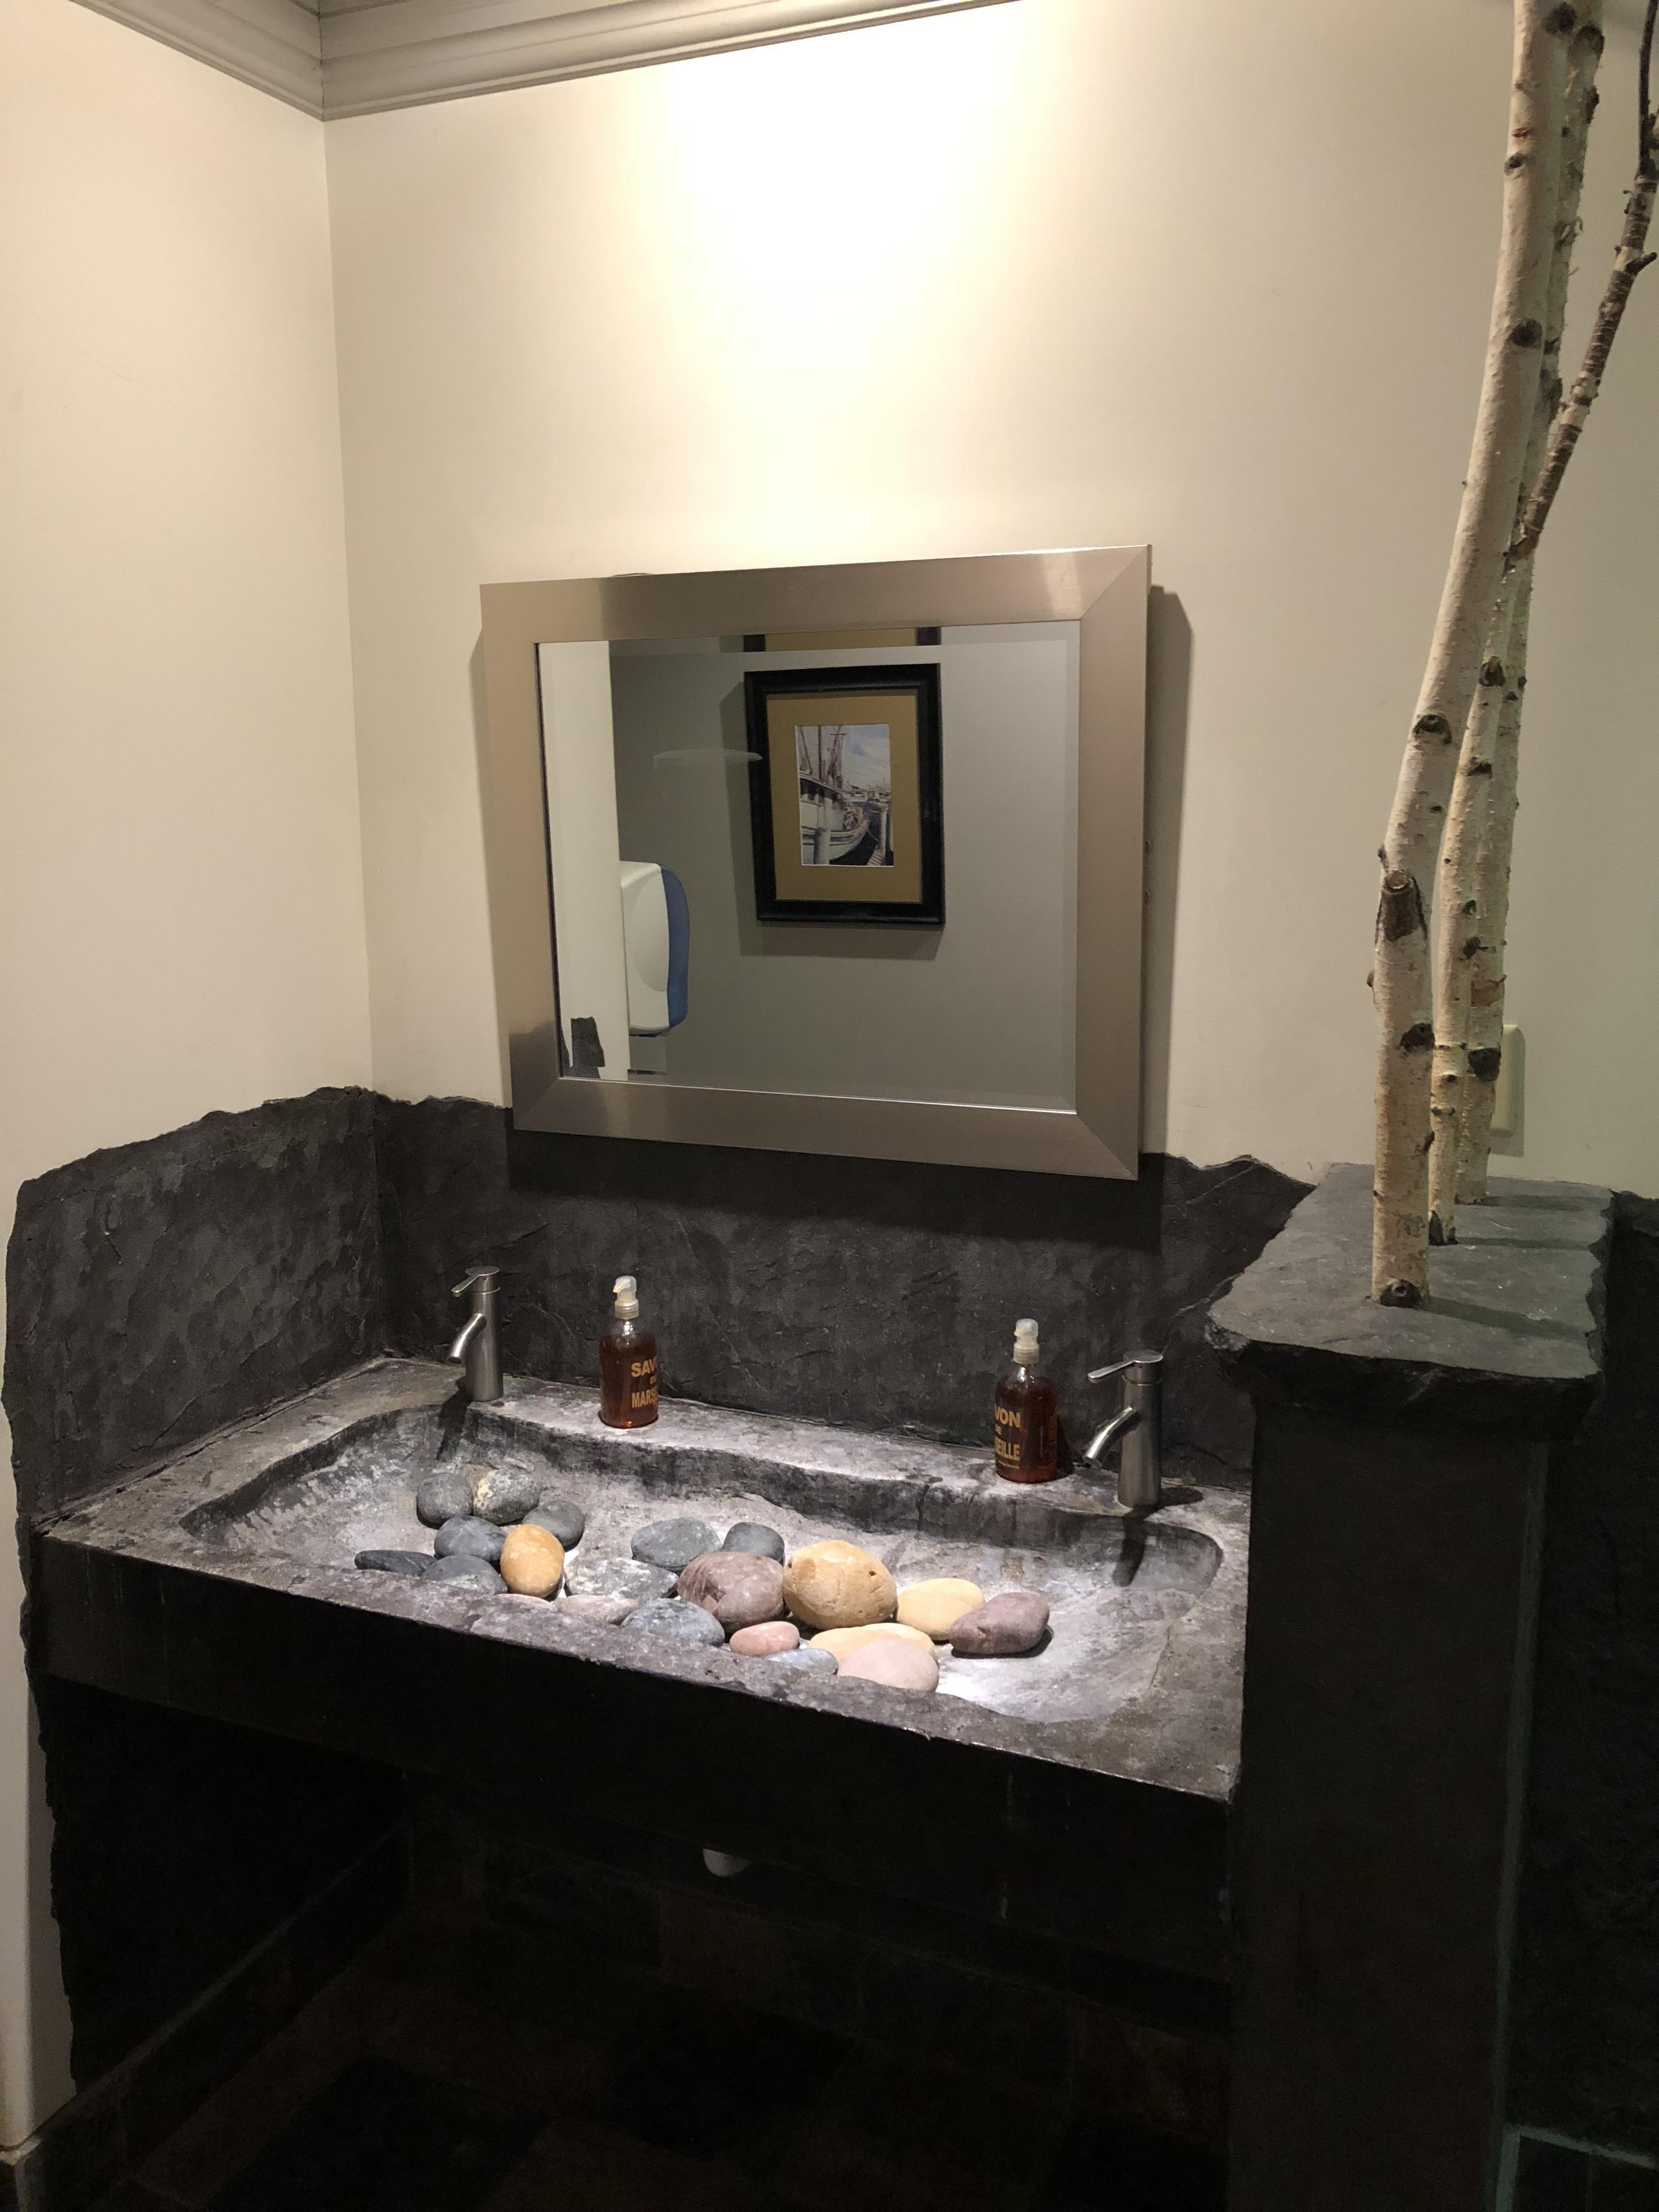 this bathroom in michigan has rocks in